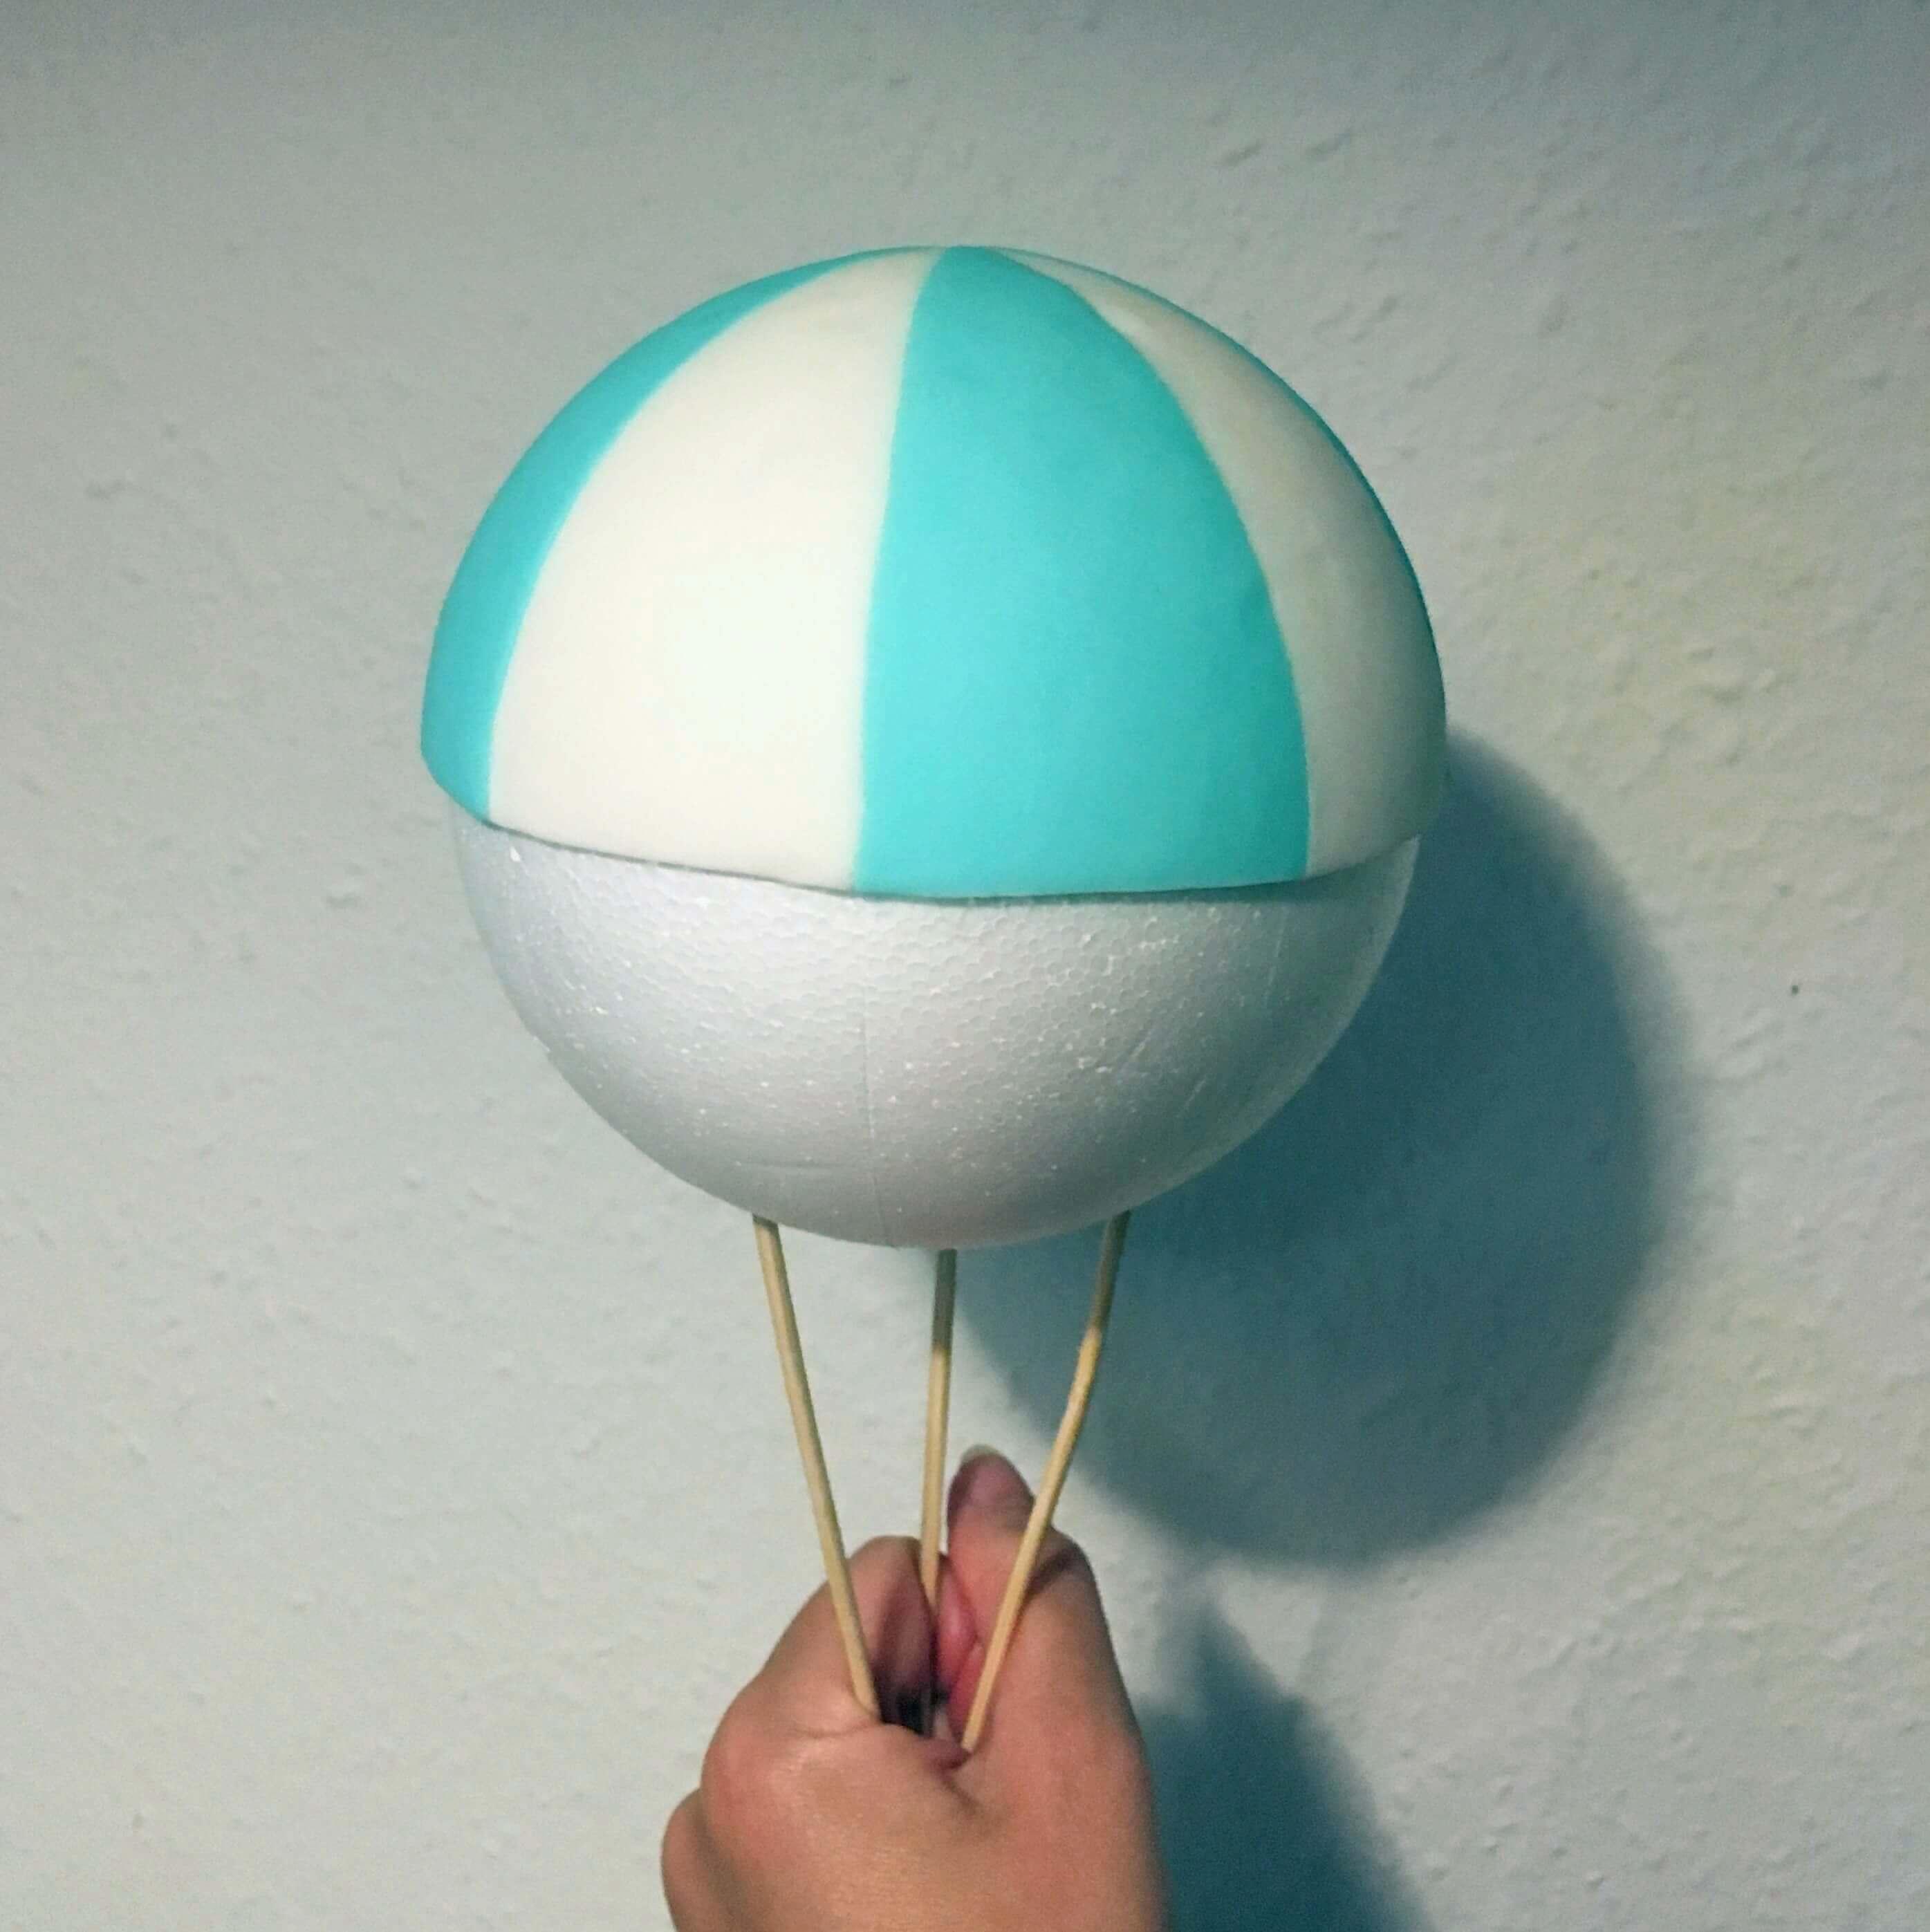 Luftballon step 1